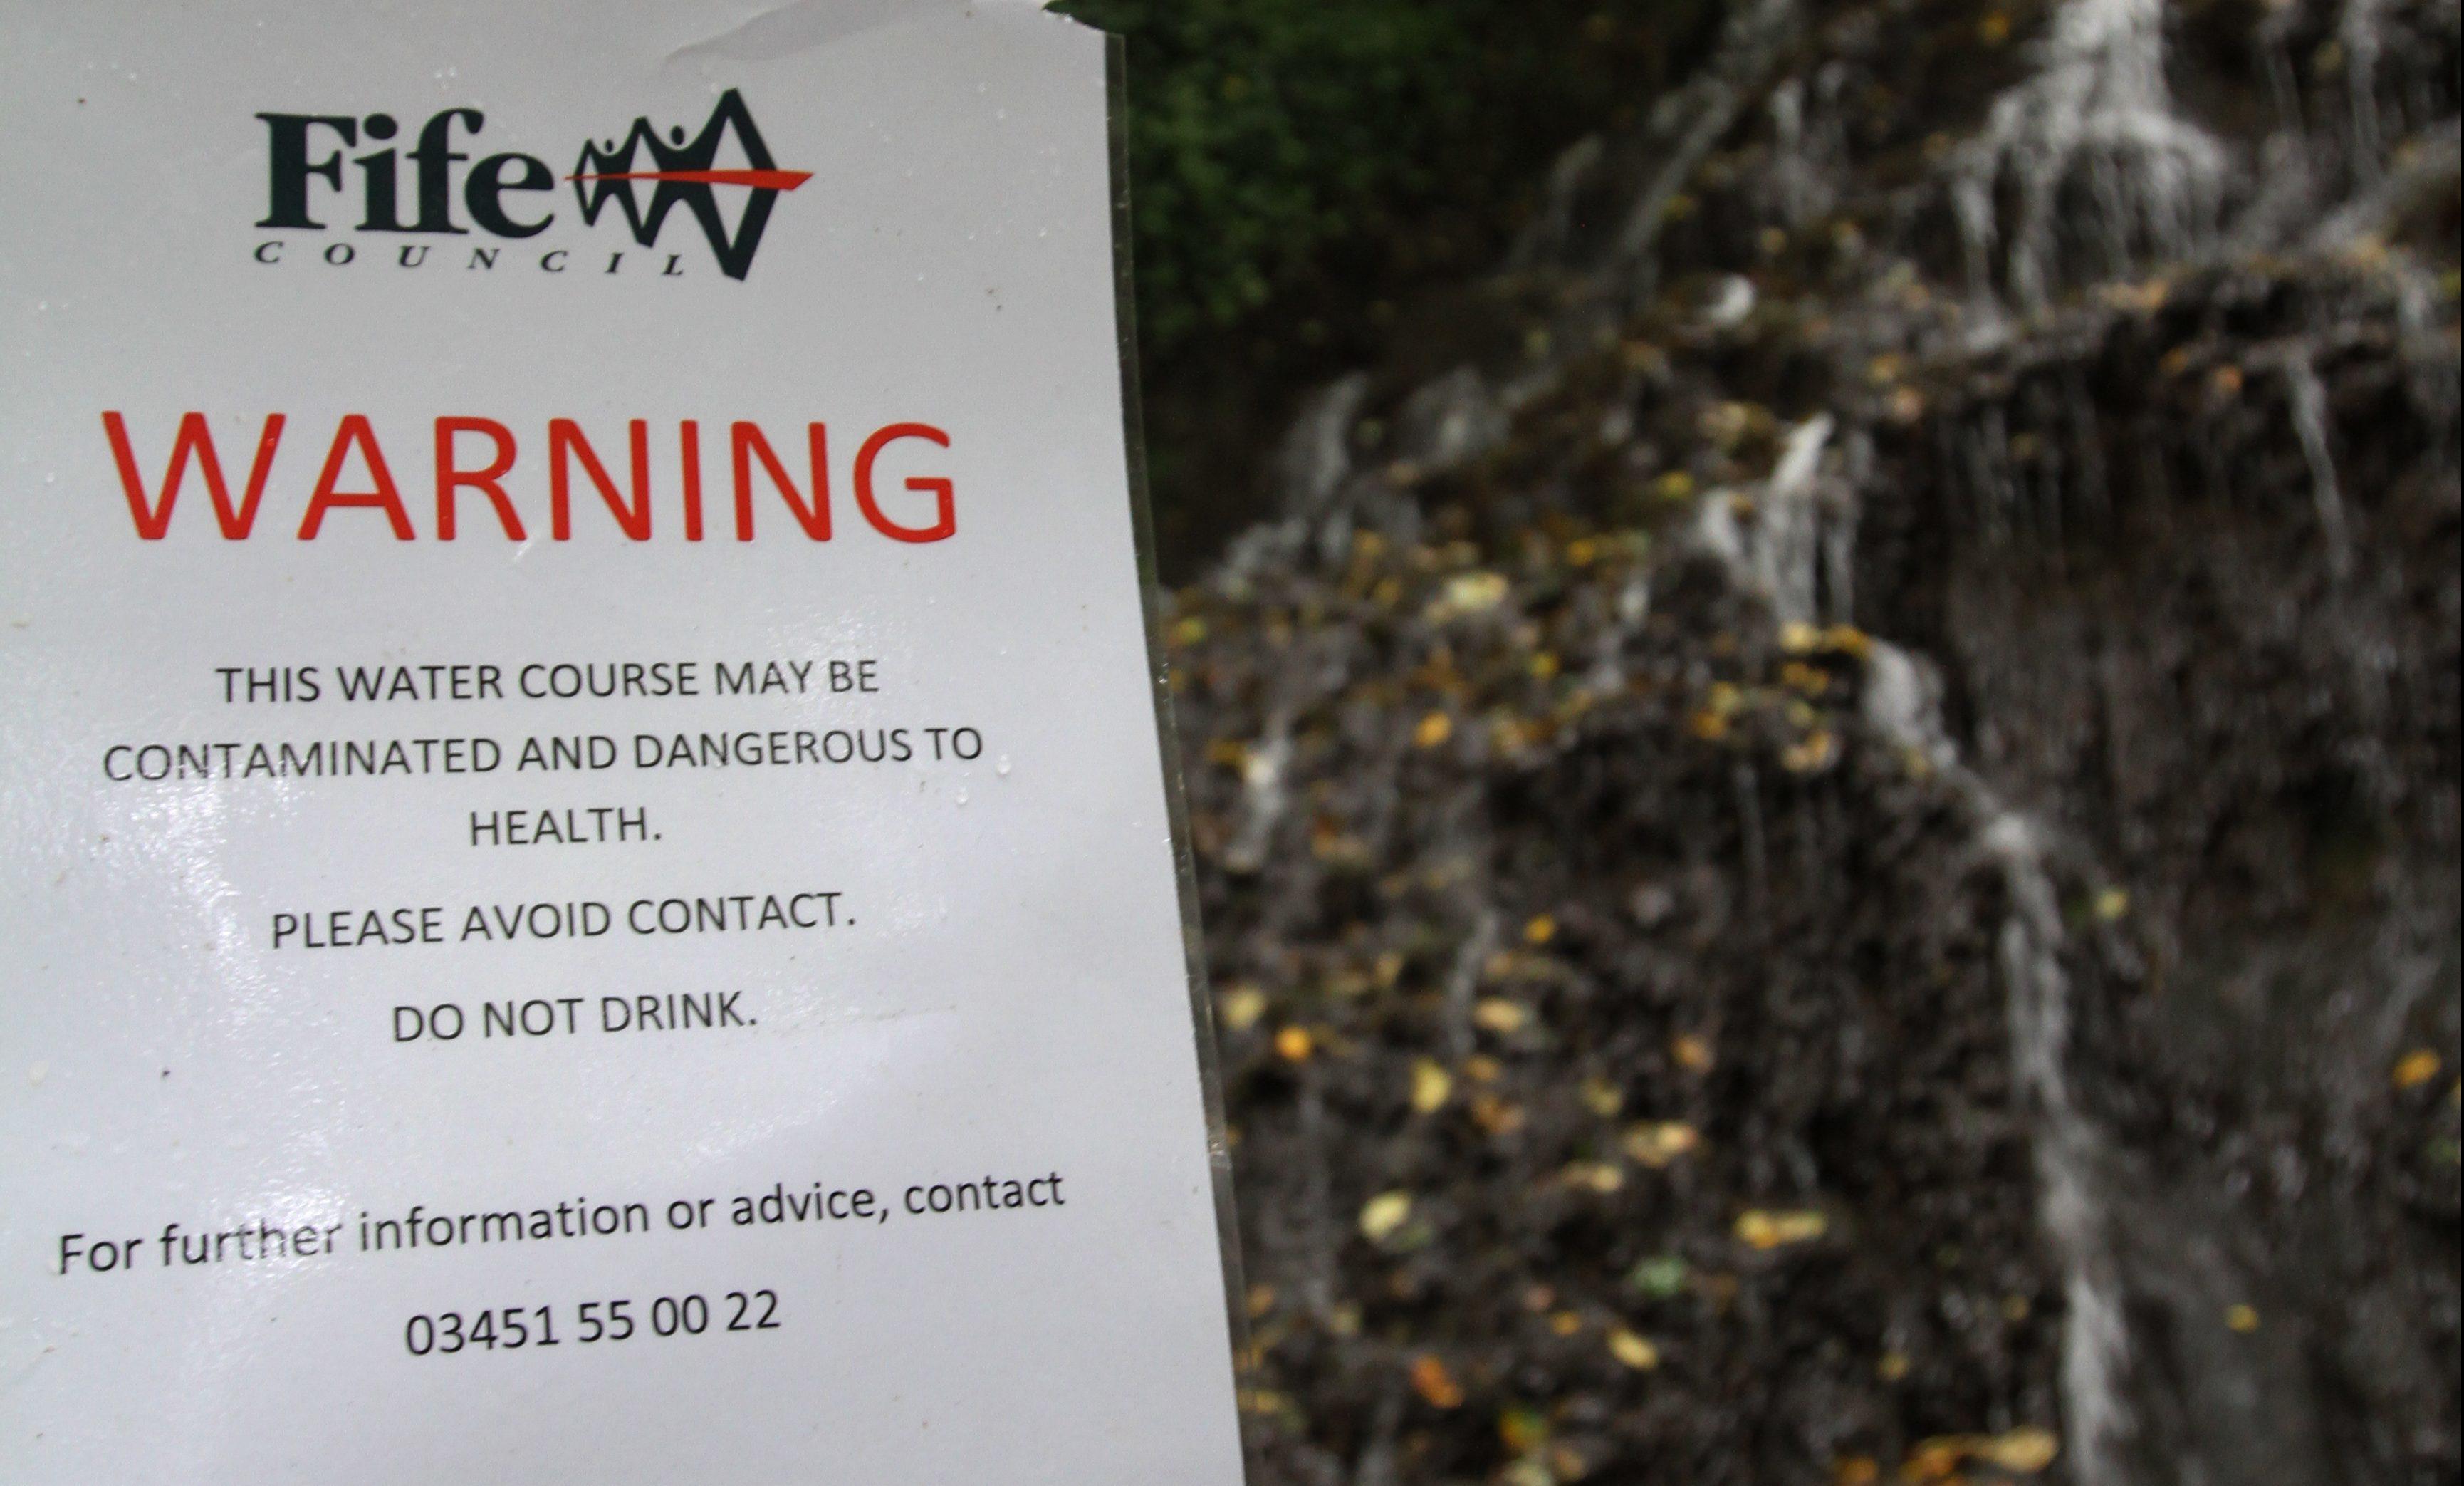 The waterfall at Starley Burn and the warning sign.